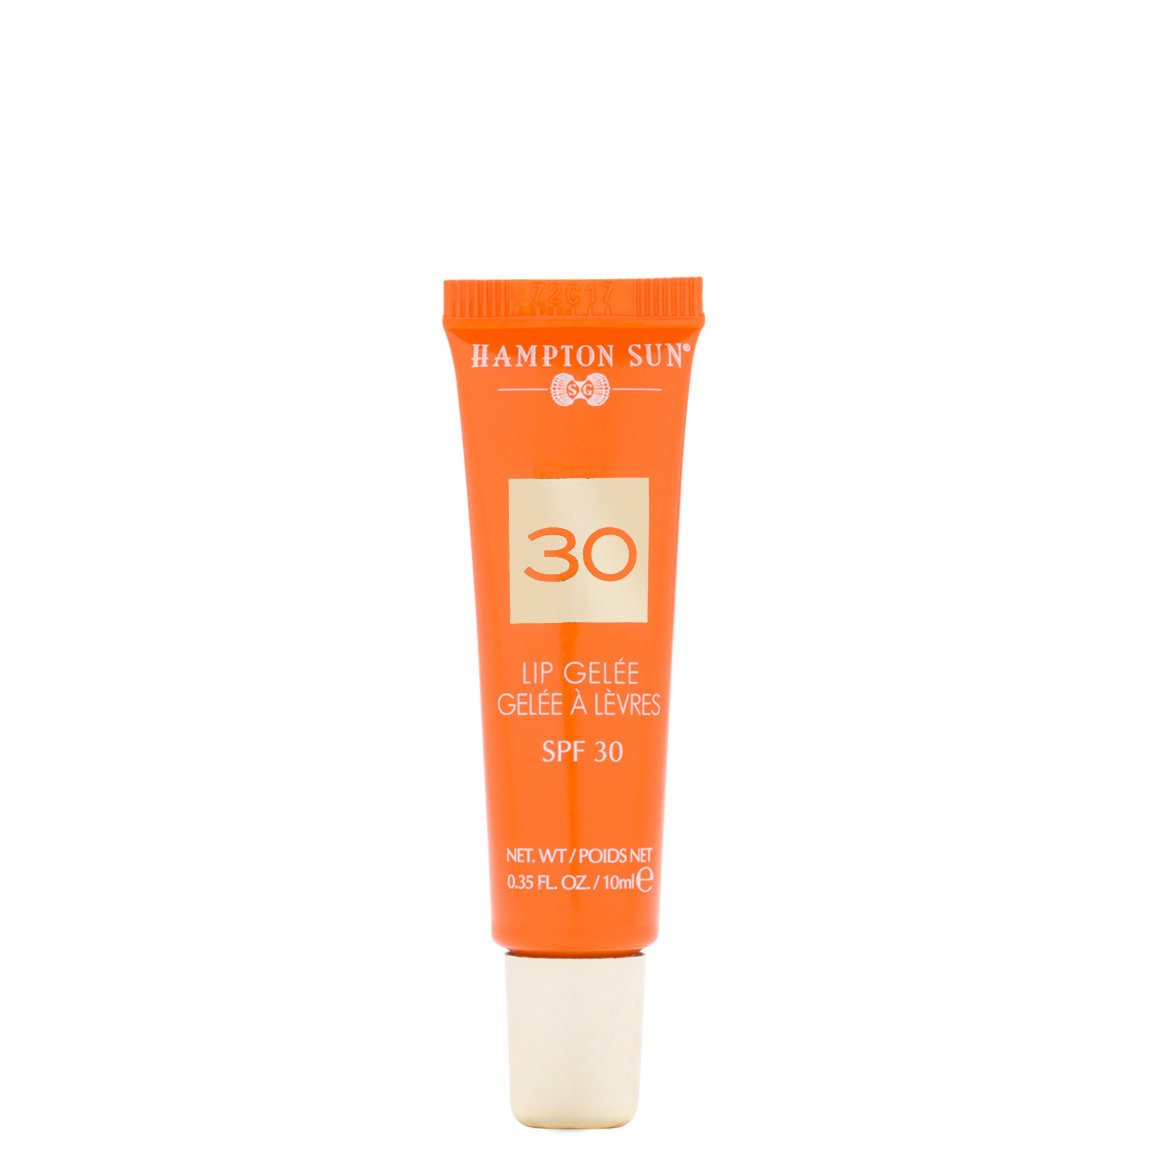 Hampton Sun SPF 30 Lip Gelée product swatch.